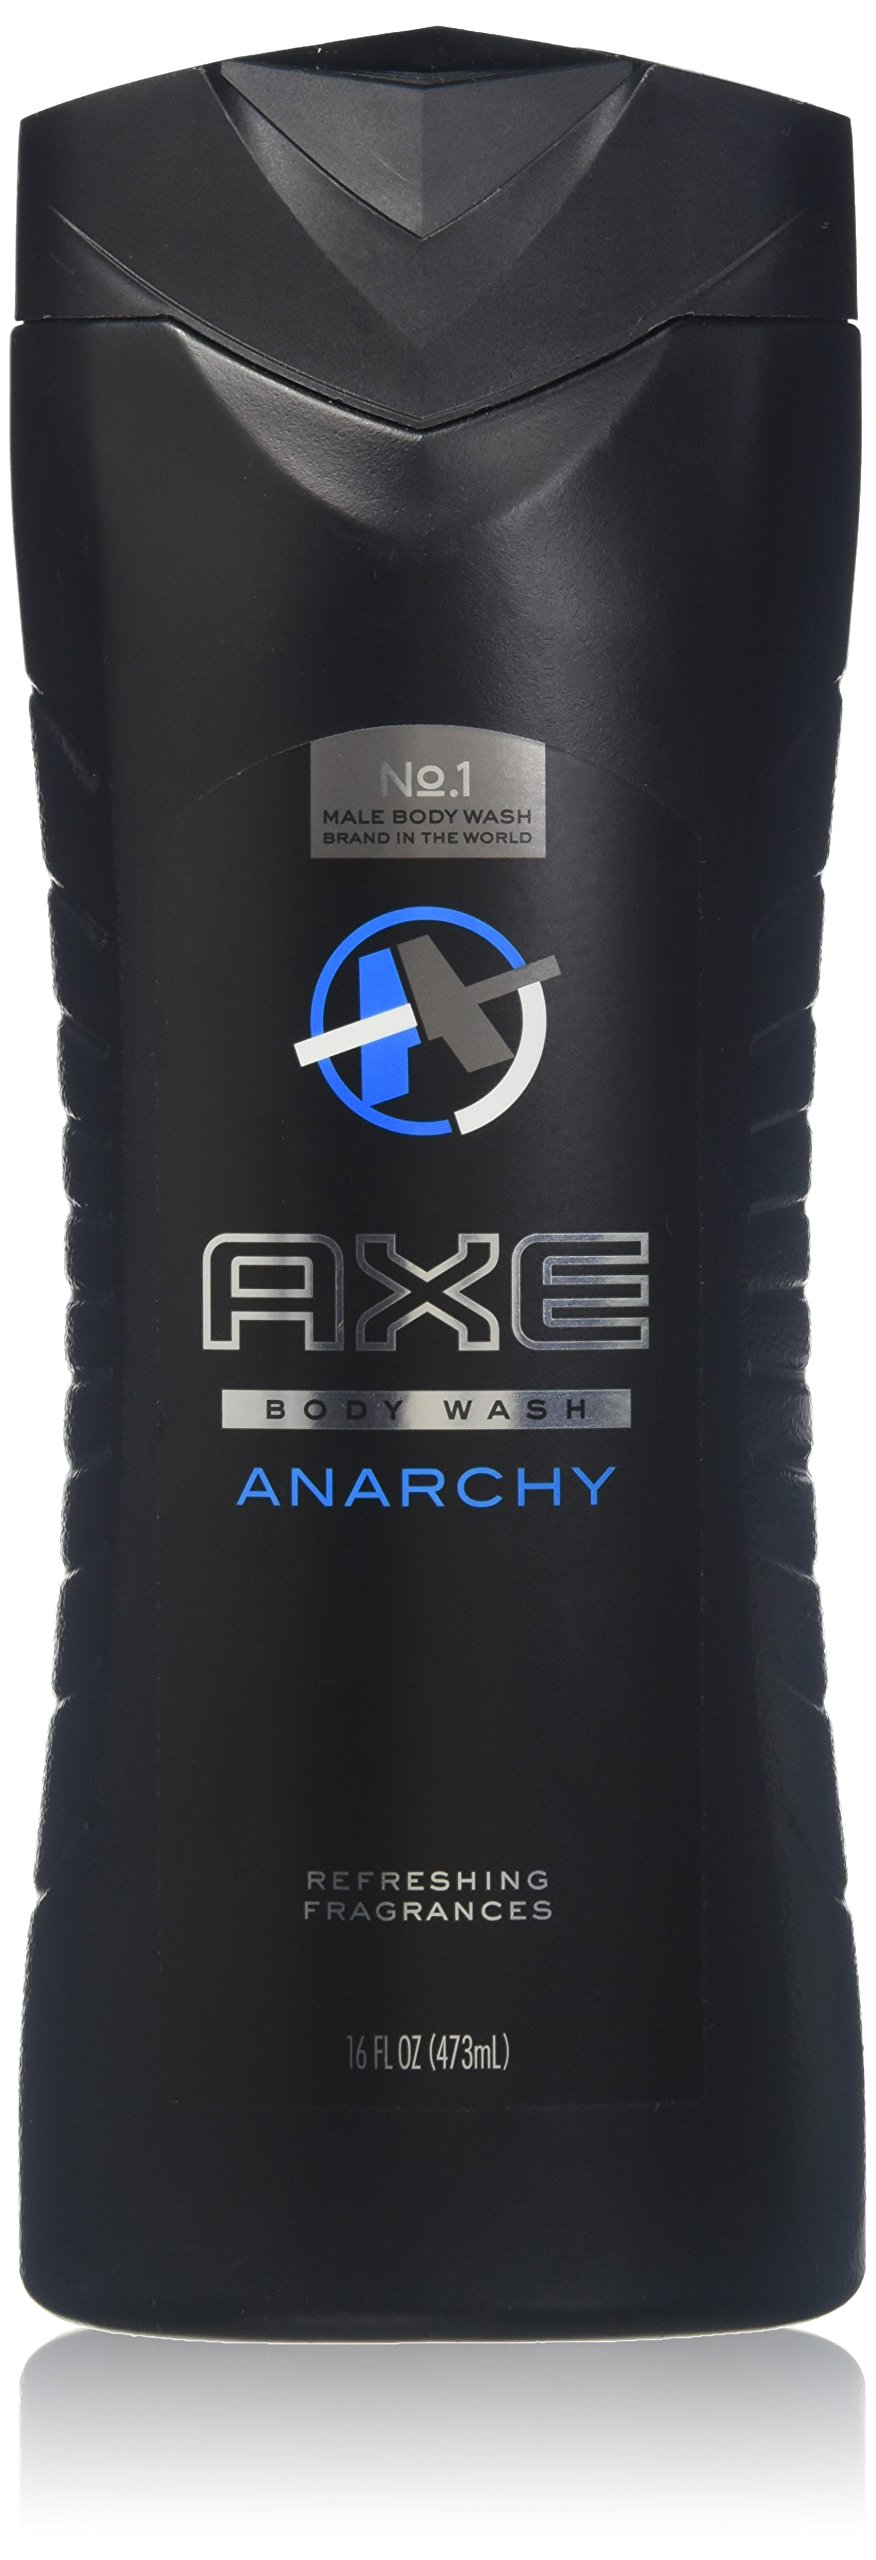 Axe Deodorant Body Spray Anarchy 150 Ml 507 Oz Pack Bodyspray Score Twin Shower Gel 16 Fluid Ounce Of 3